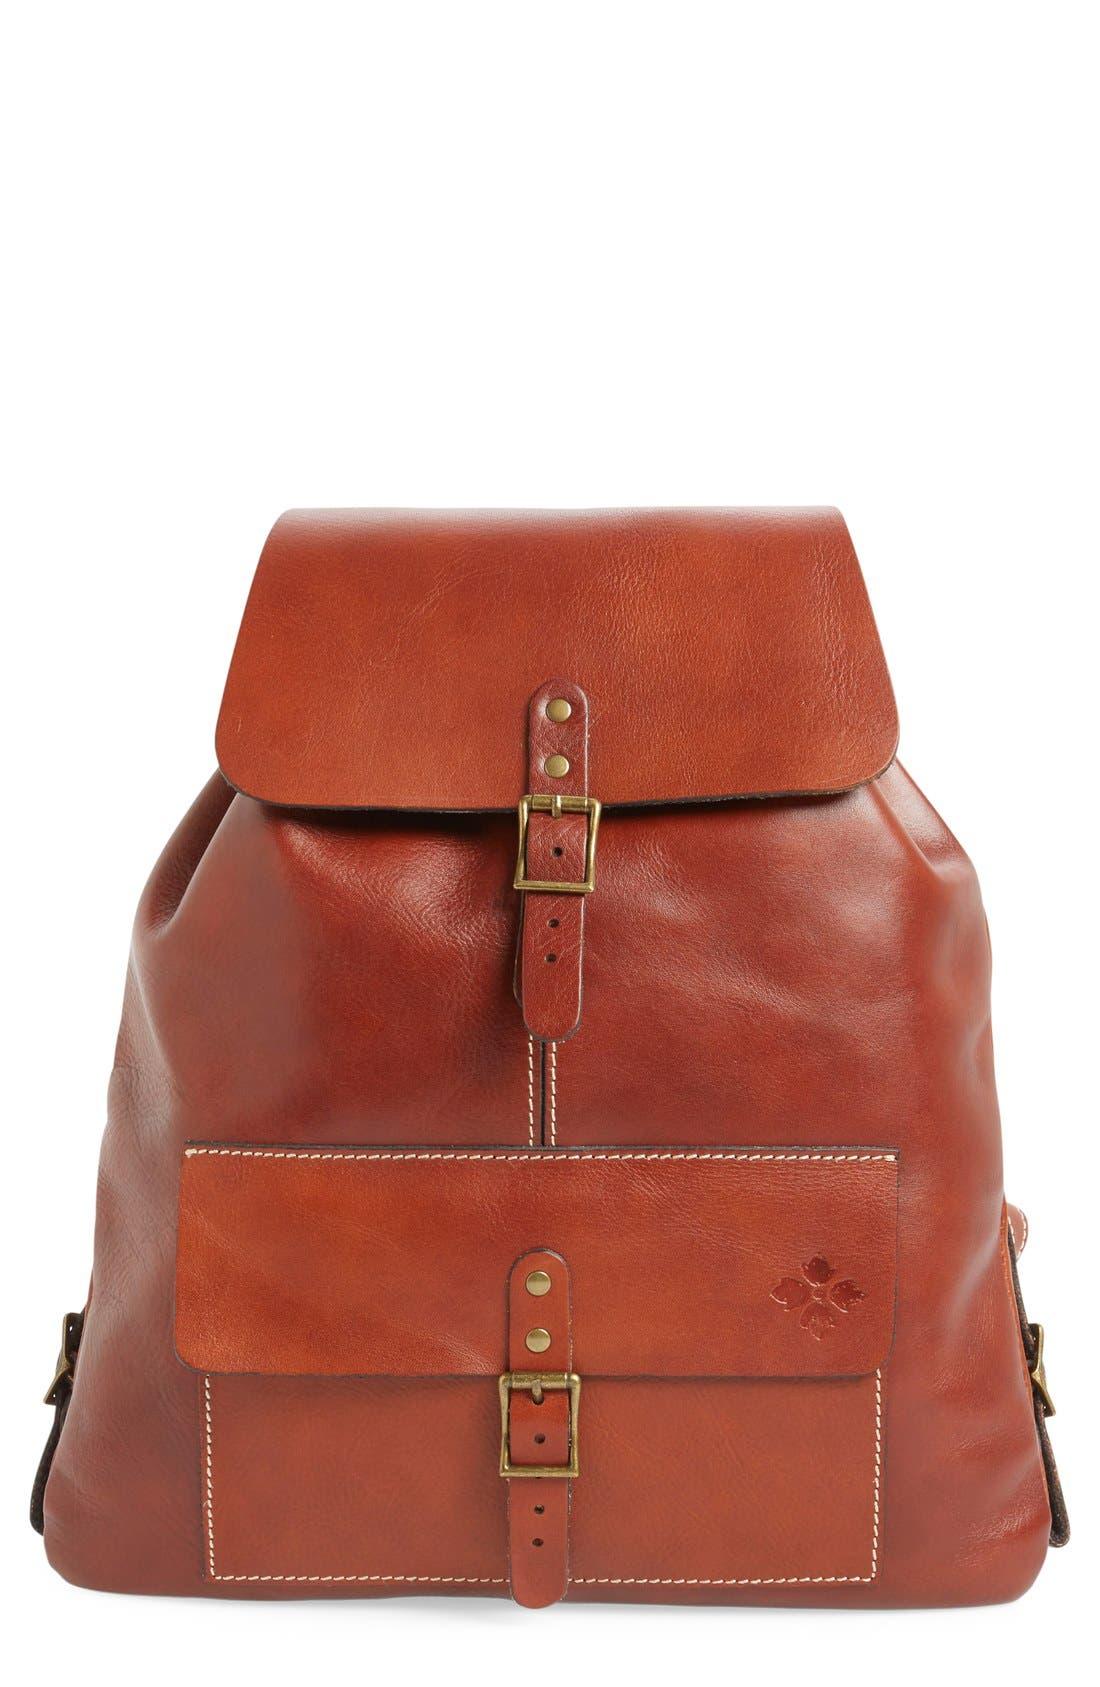 Alternate Image 1 Selected - Patricia Nash 'Atrani' Drawstring Backpack